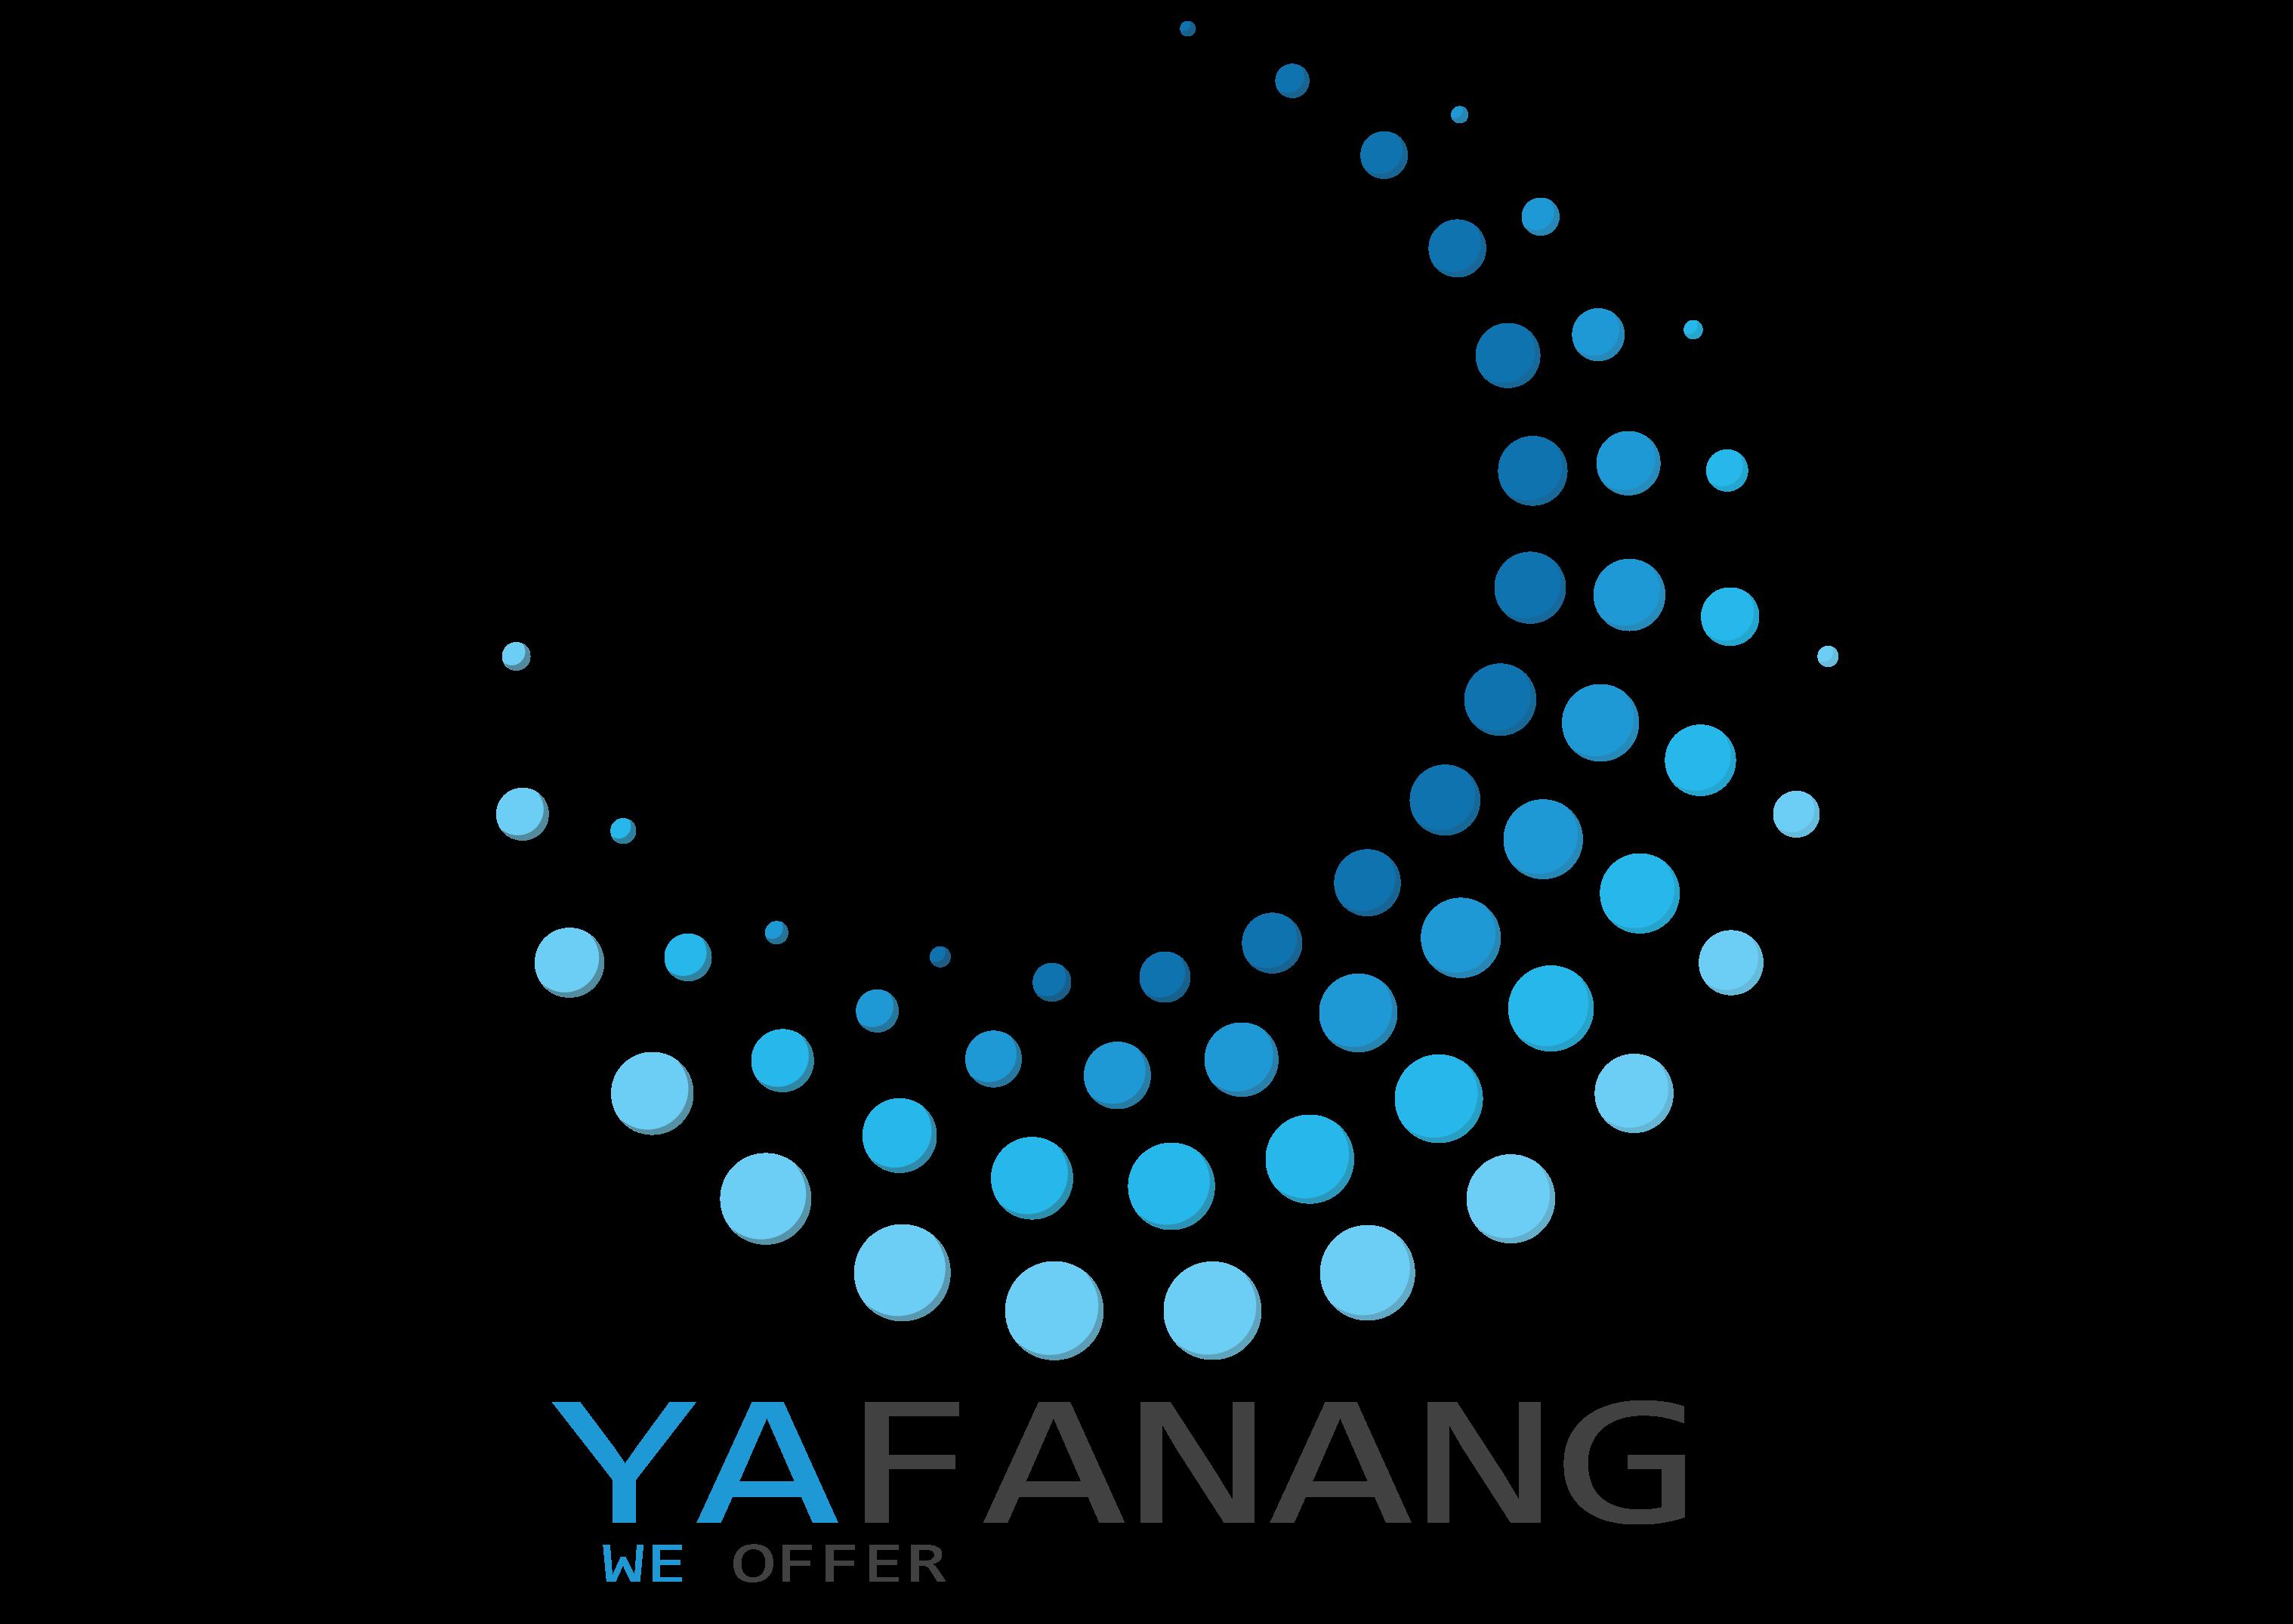 Ya Fanang